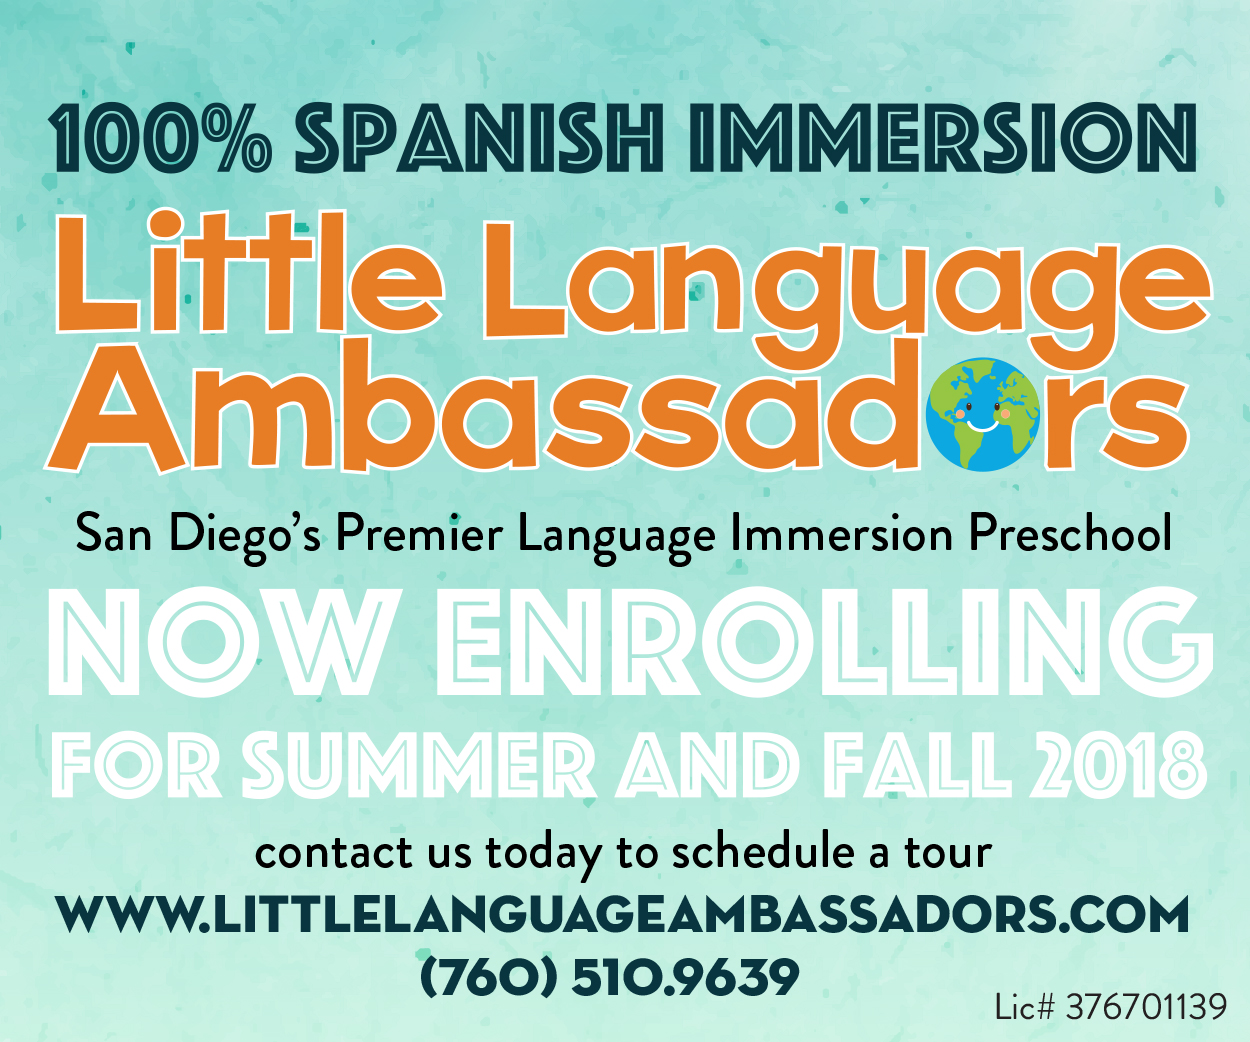 Little Language Ambassadors